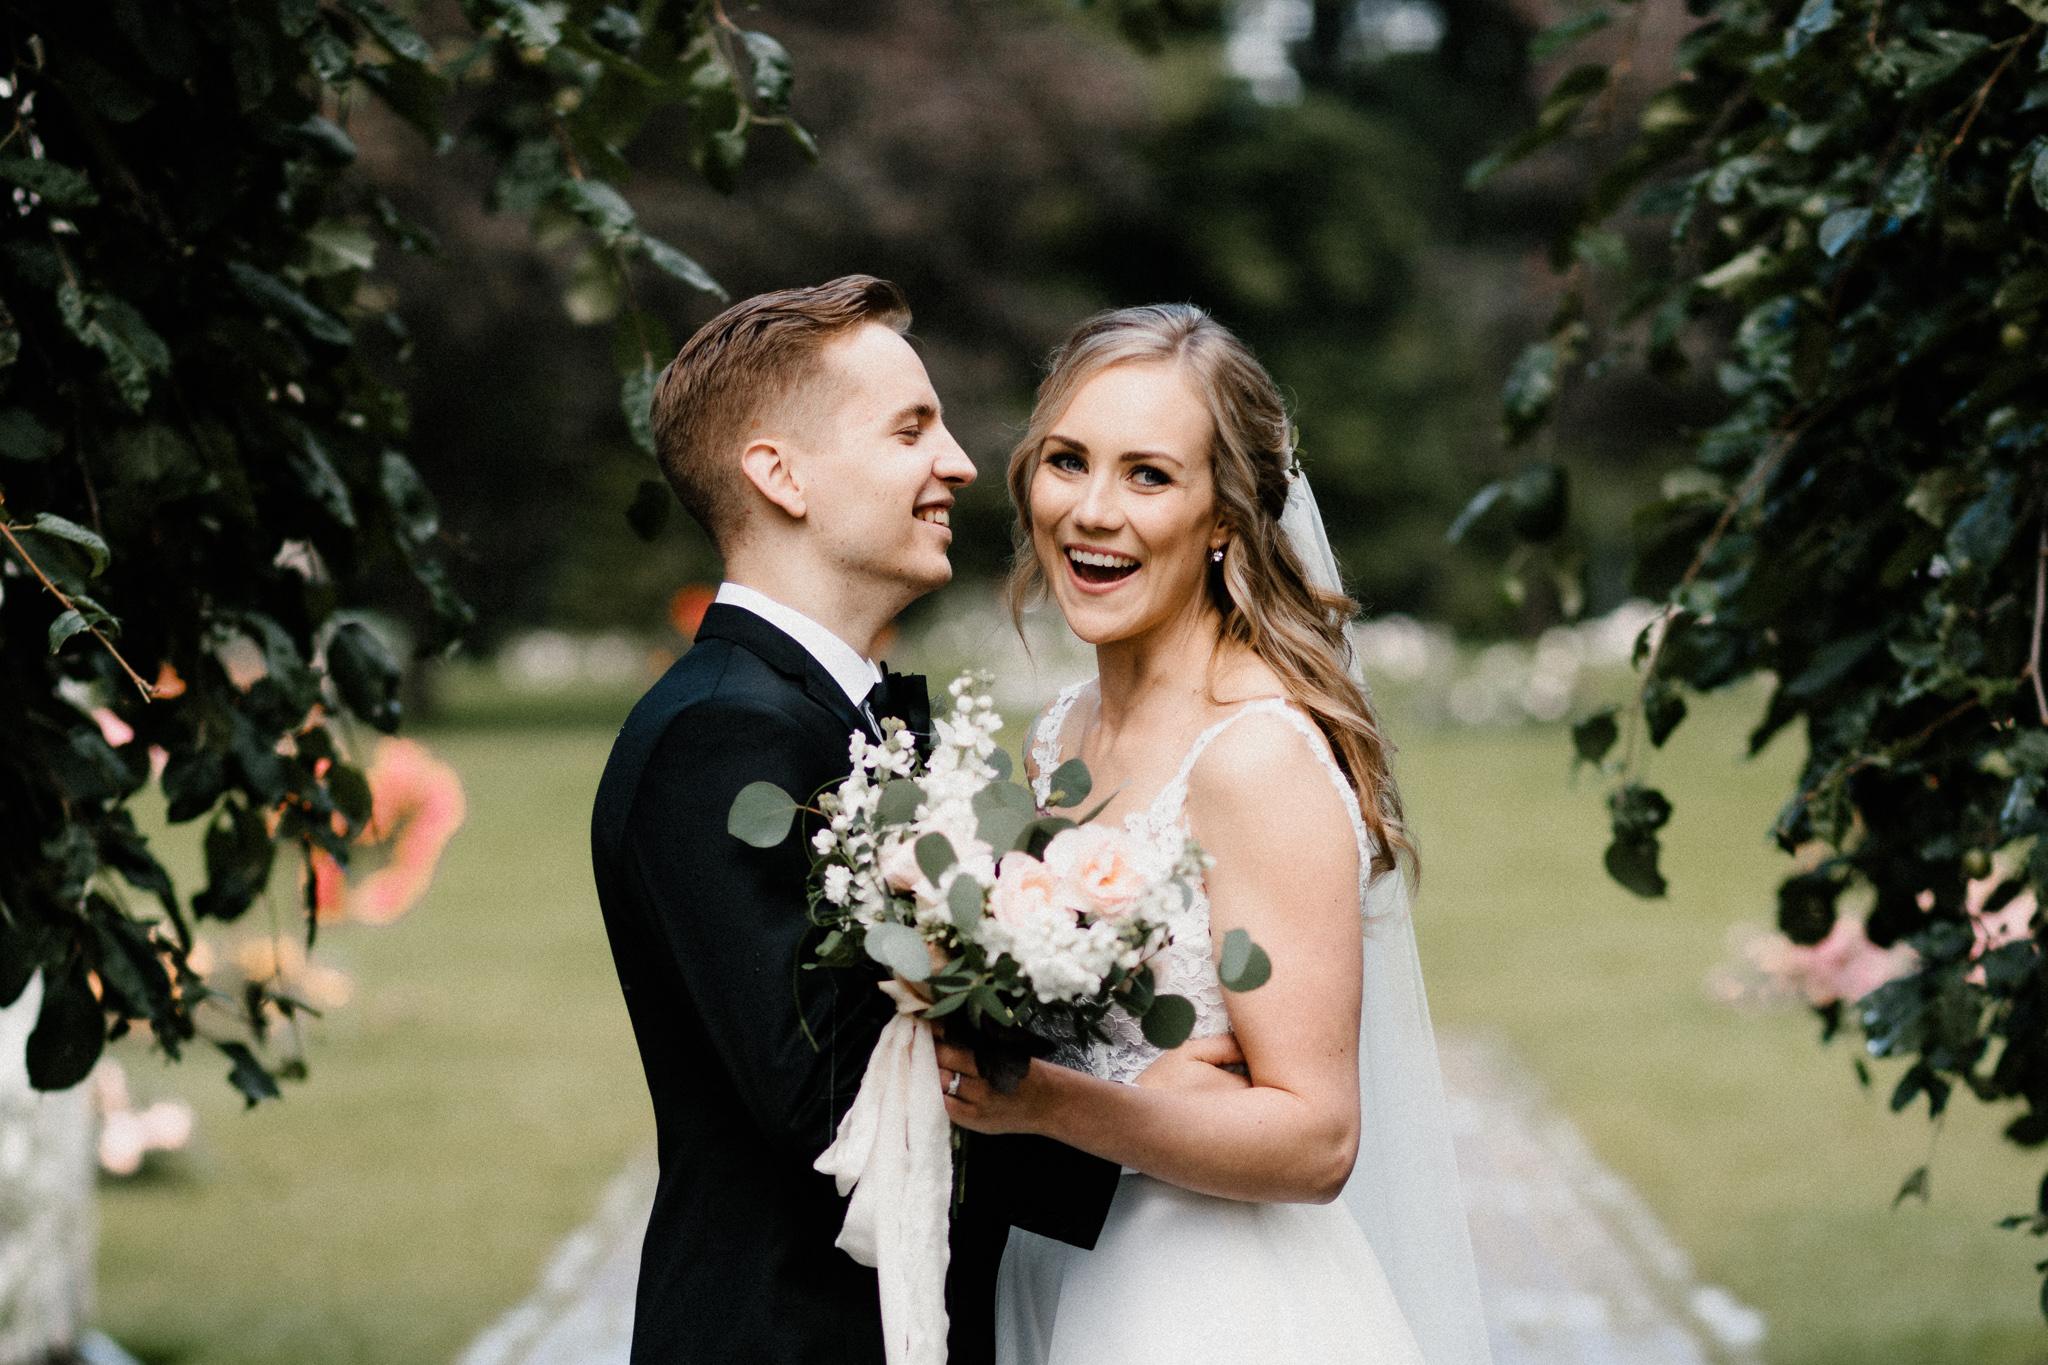 Johanna + Mikko - Tampere - Photo by Patrick Karkkolainen Wedding Photographer-26.jpg